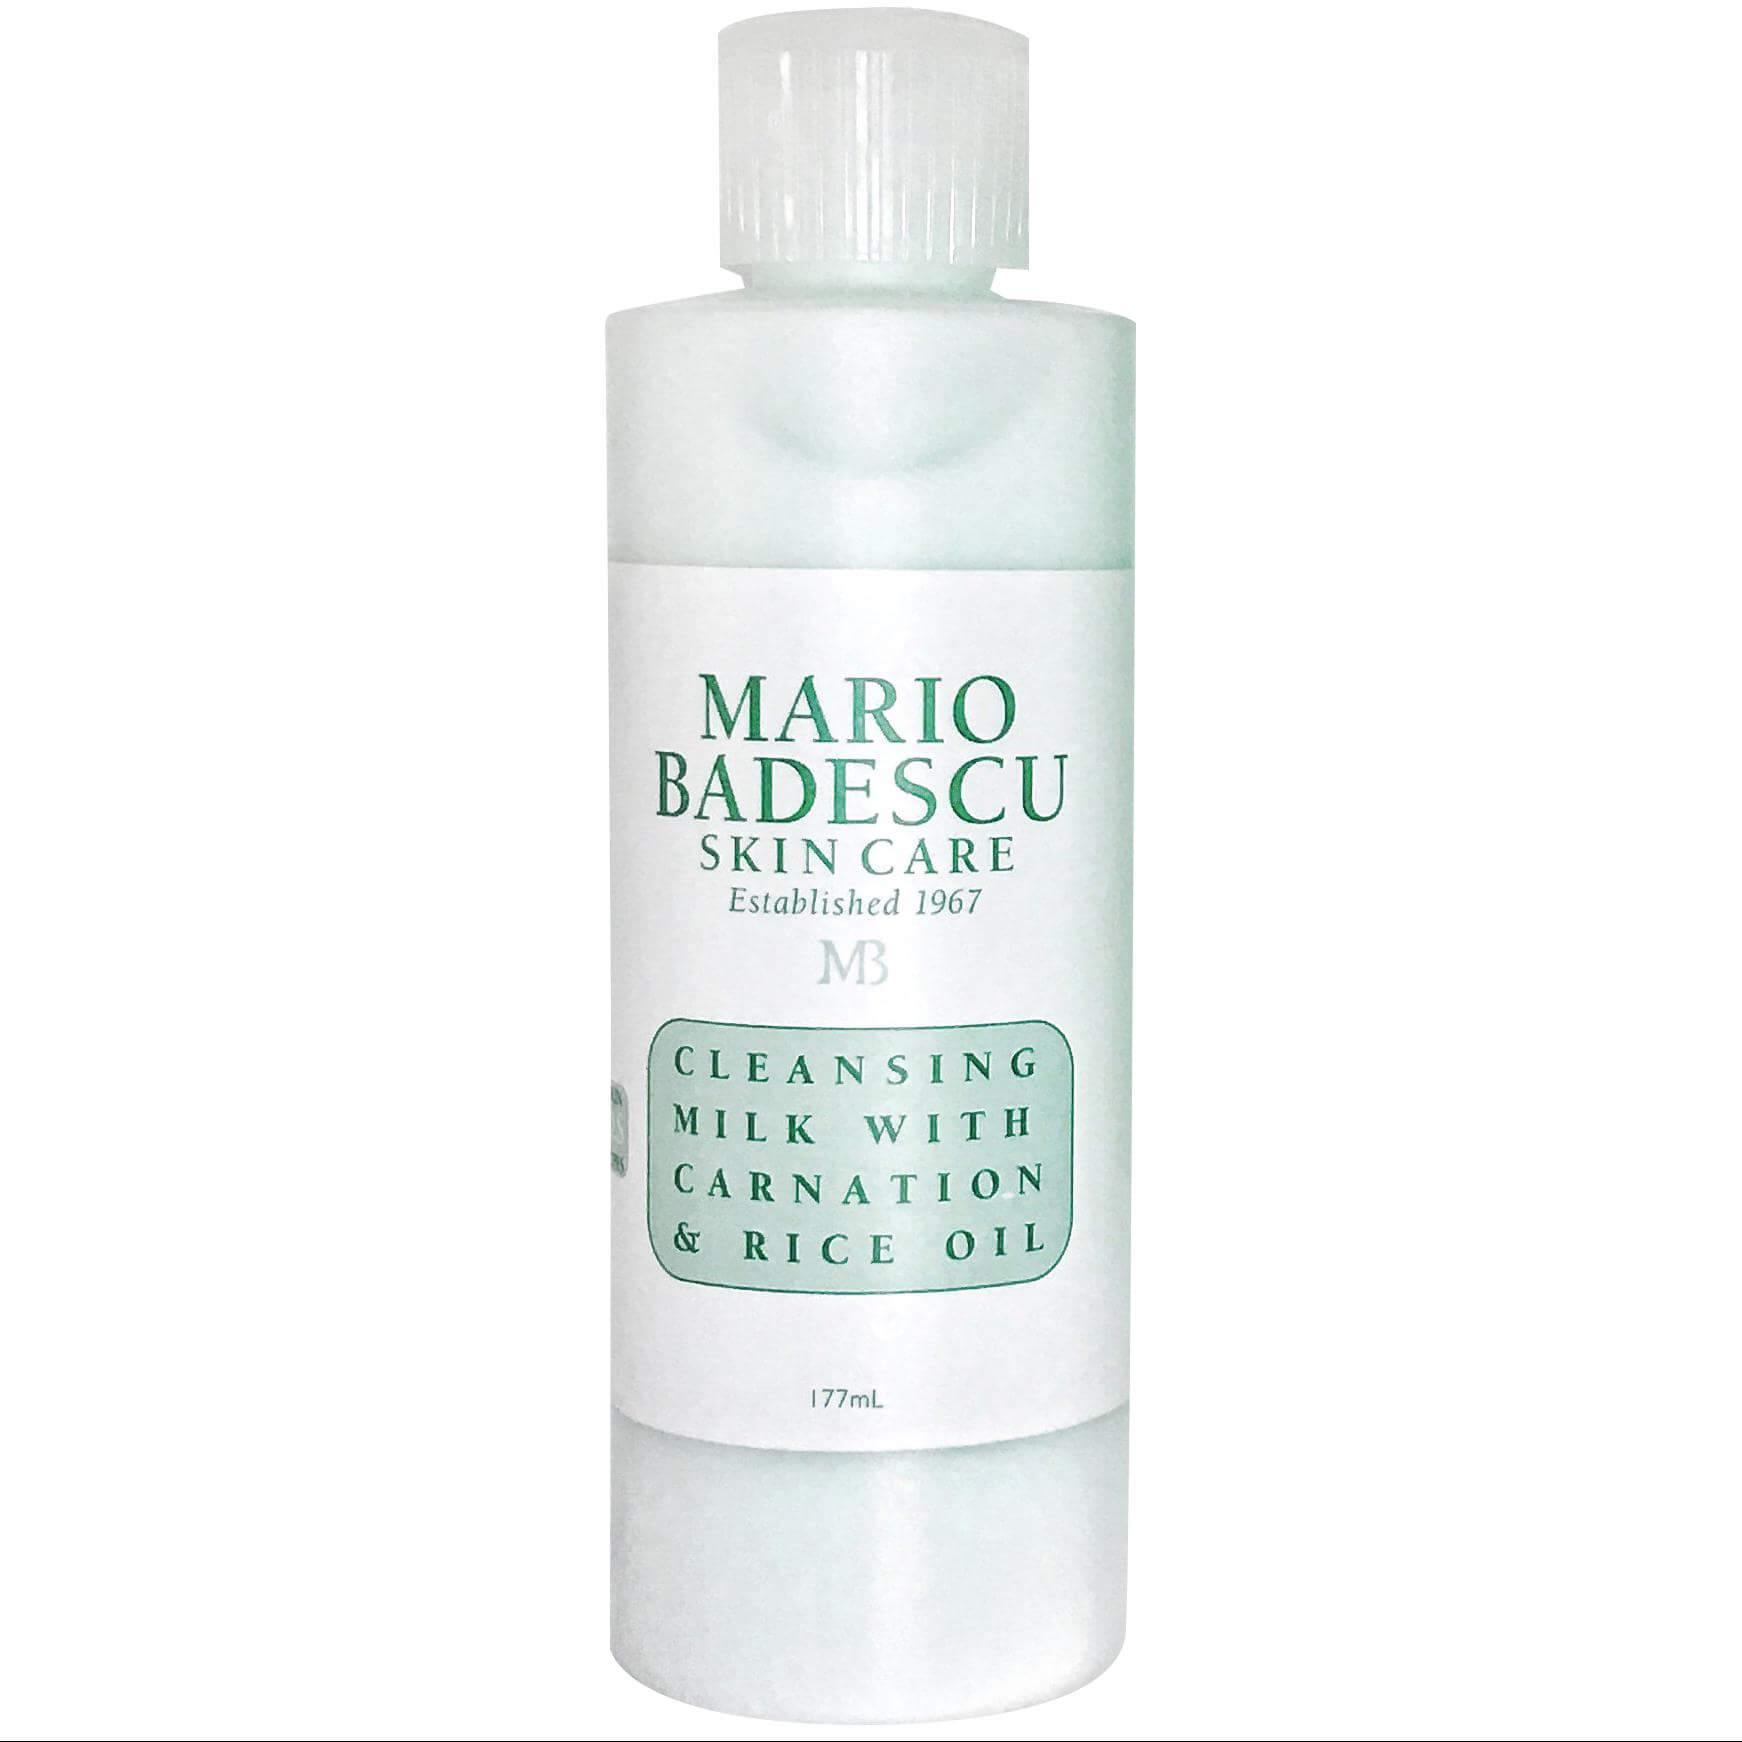 Mario Badescu Cleansing Milk With Carnation & Rice Oil Γαλάκτωμα Καθαρισμού & Ντεμακιγιάζ, Εμπλουτισμένο με Έλαιο Ρυζιού 177ml